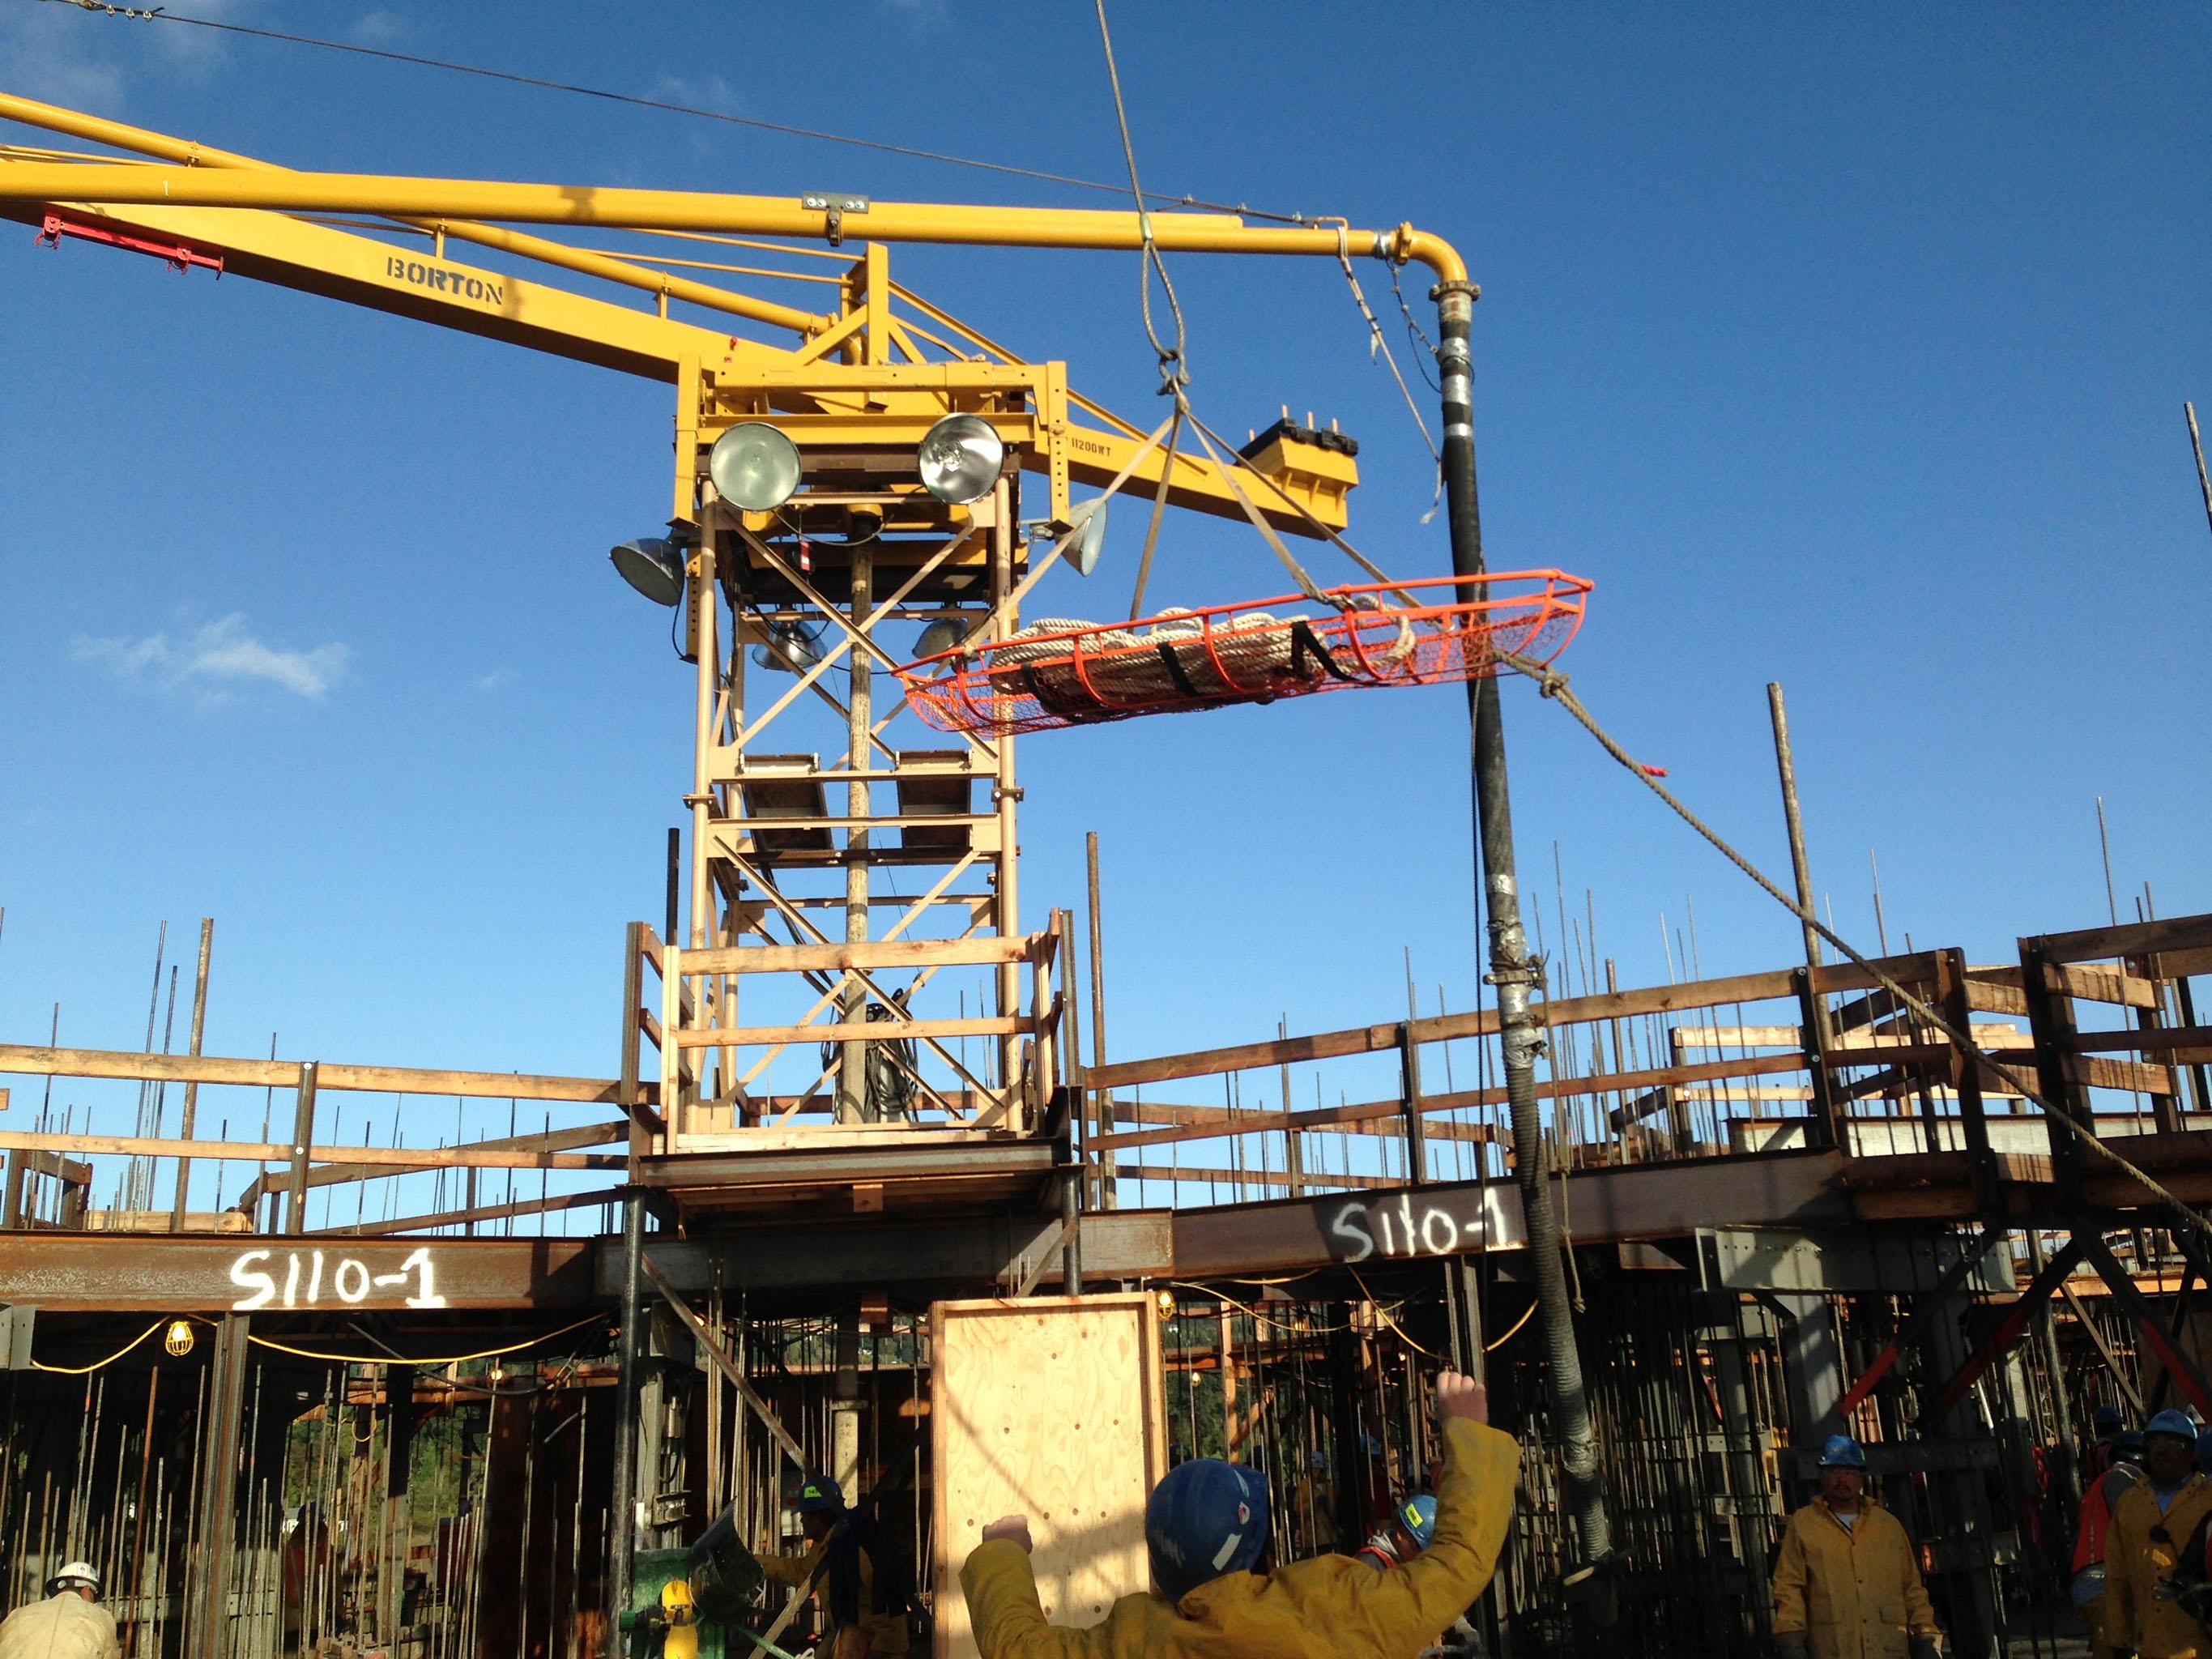 Tower Crane Rescue Procedure : Projects gew llc